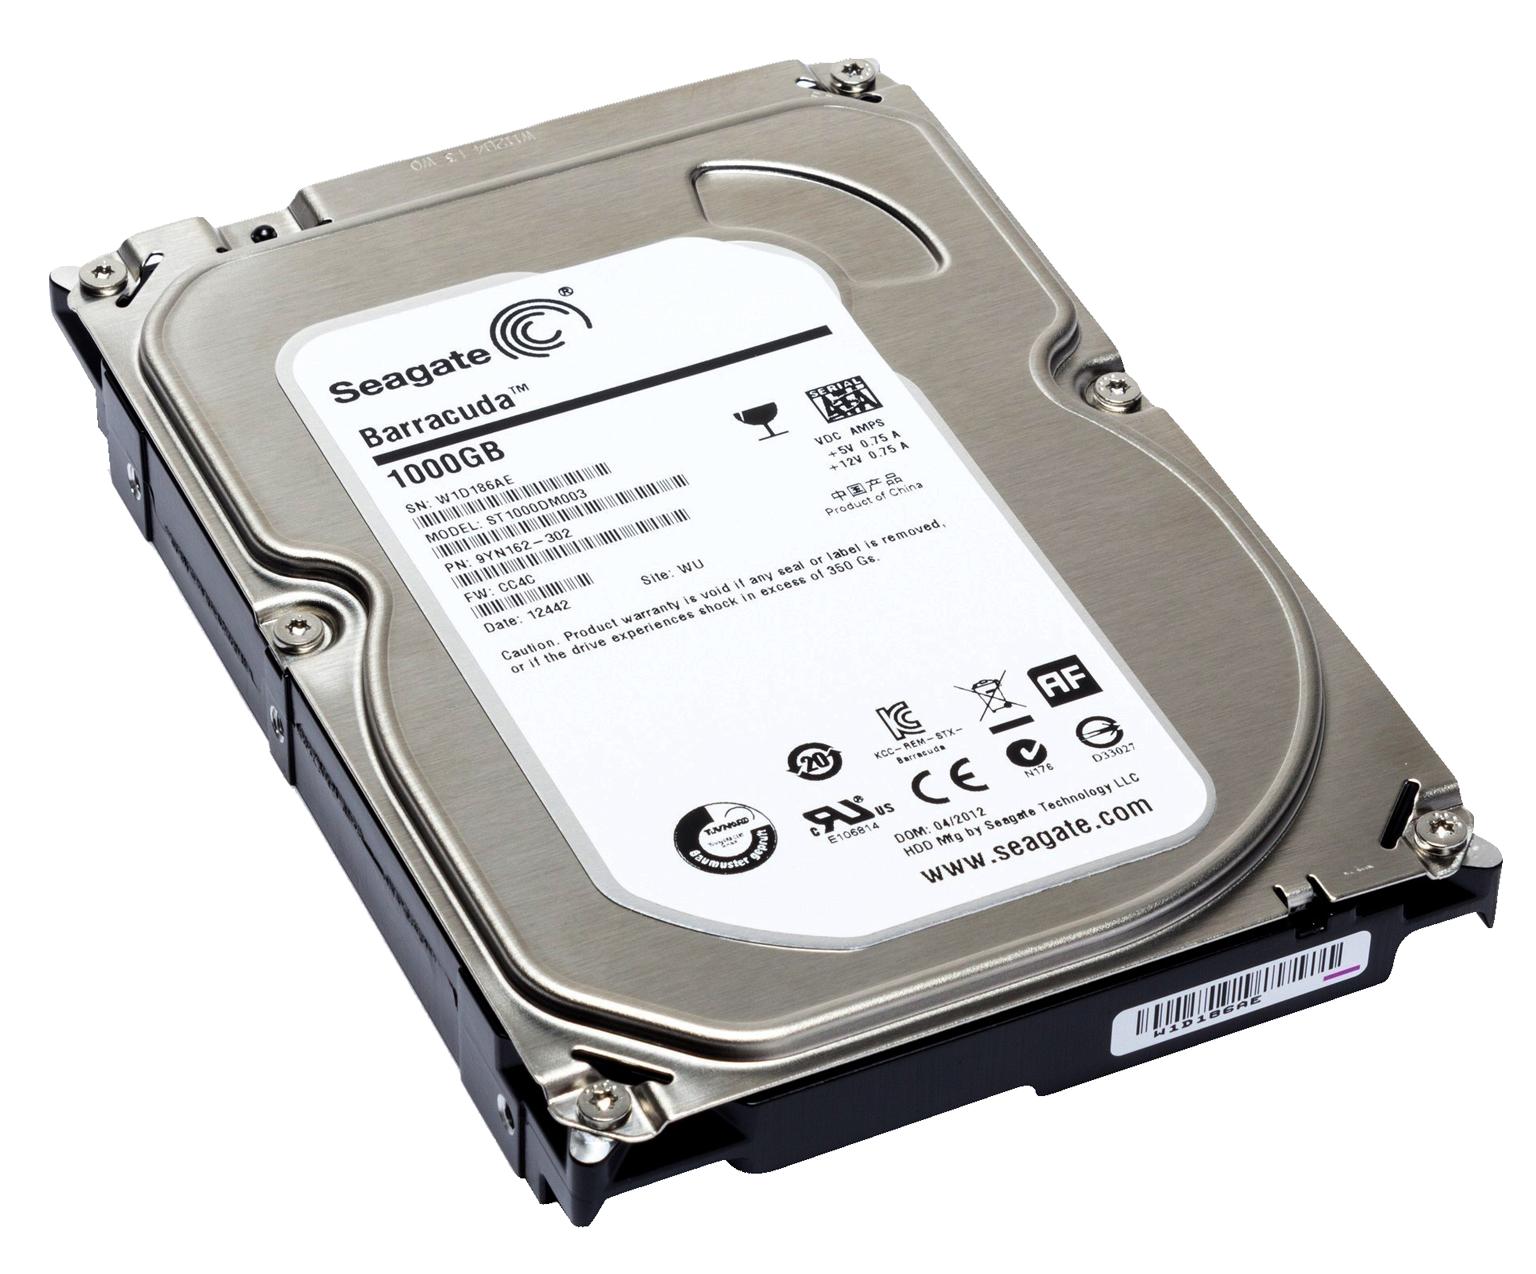 Computer Hard Disk Drive PNG Image.